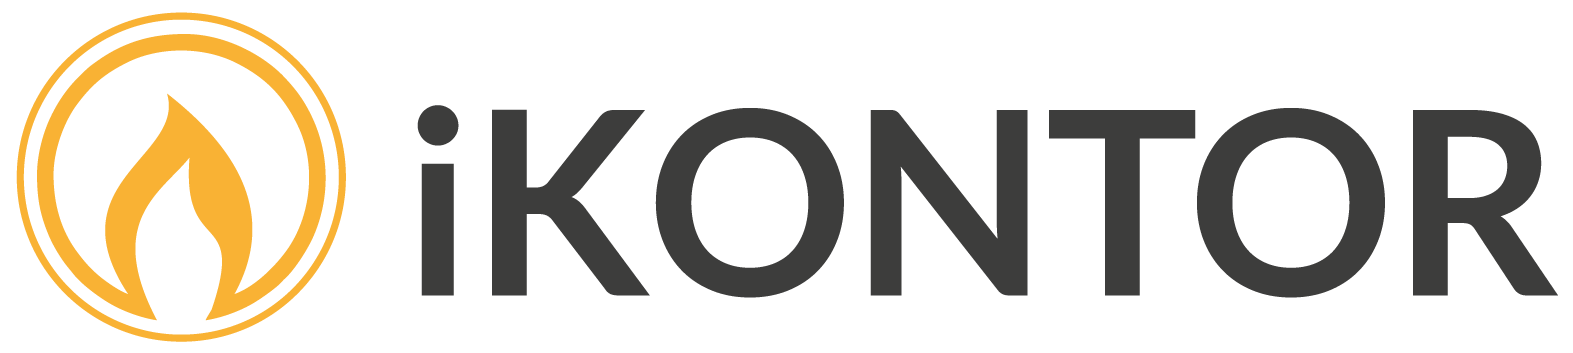 iKontor GmbH